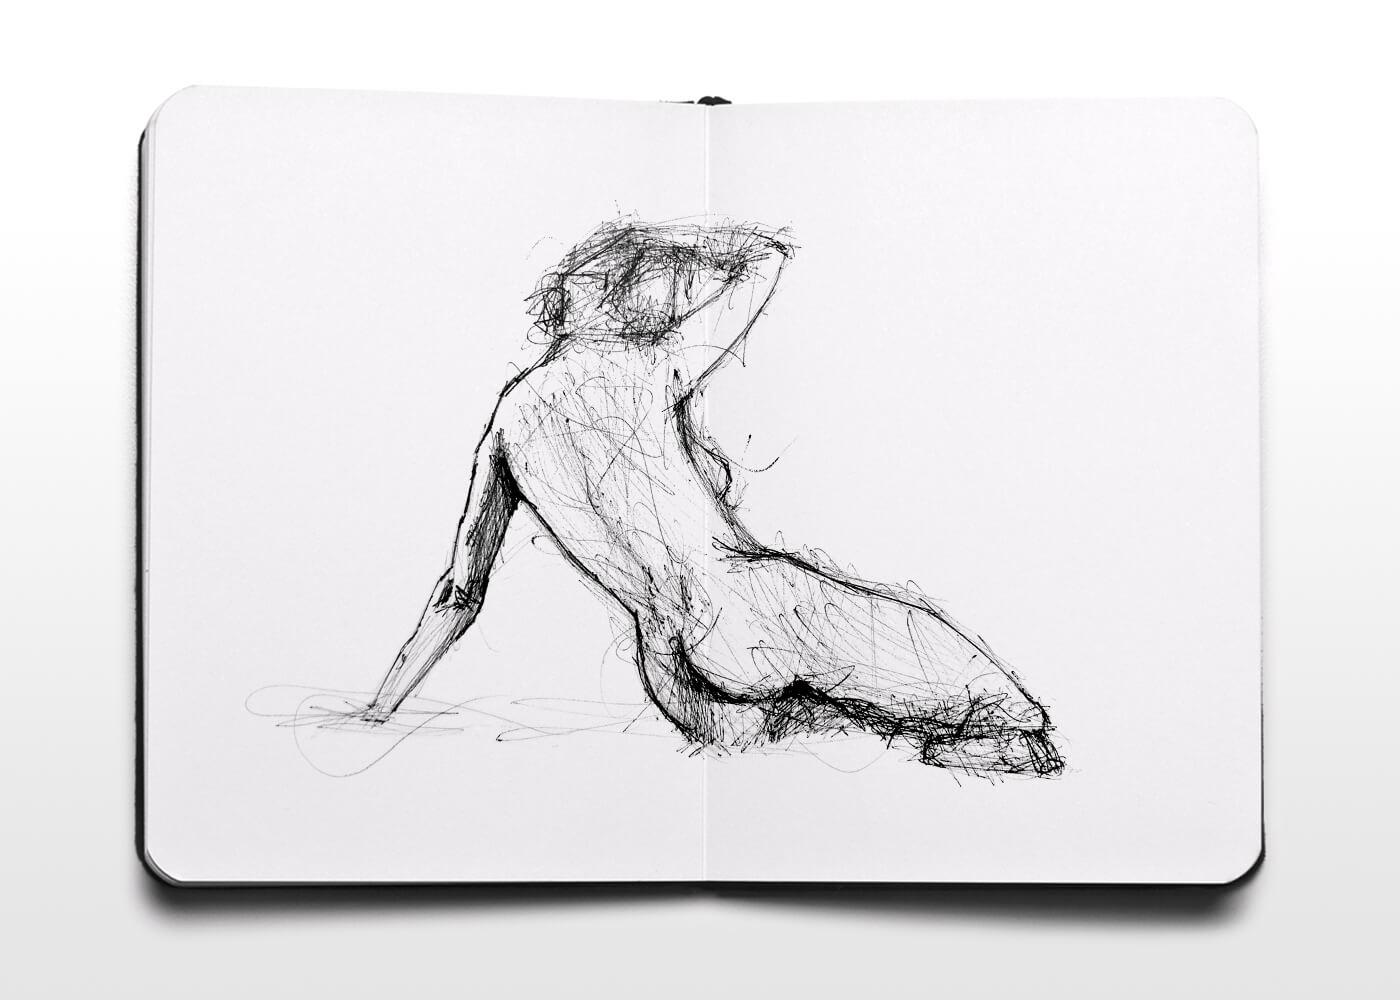 Dibujo De Mujer Desnuda 3 - Nude Woman Drawing 3